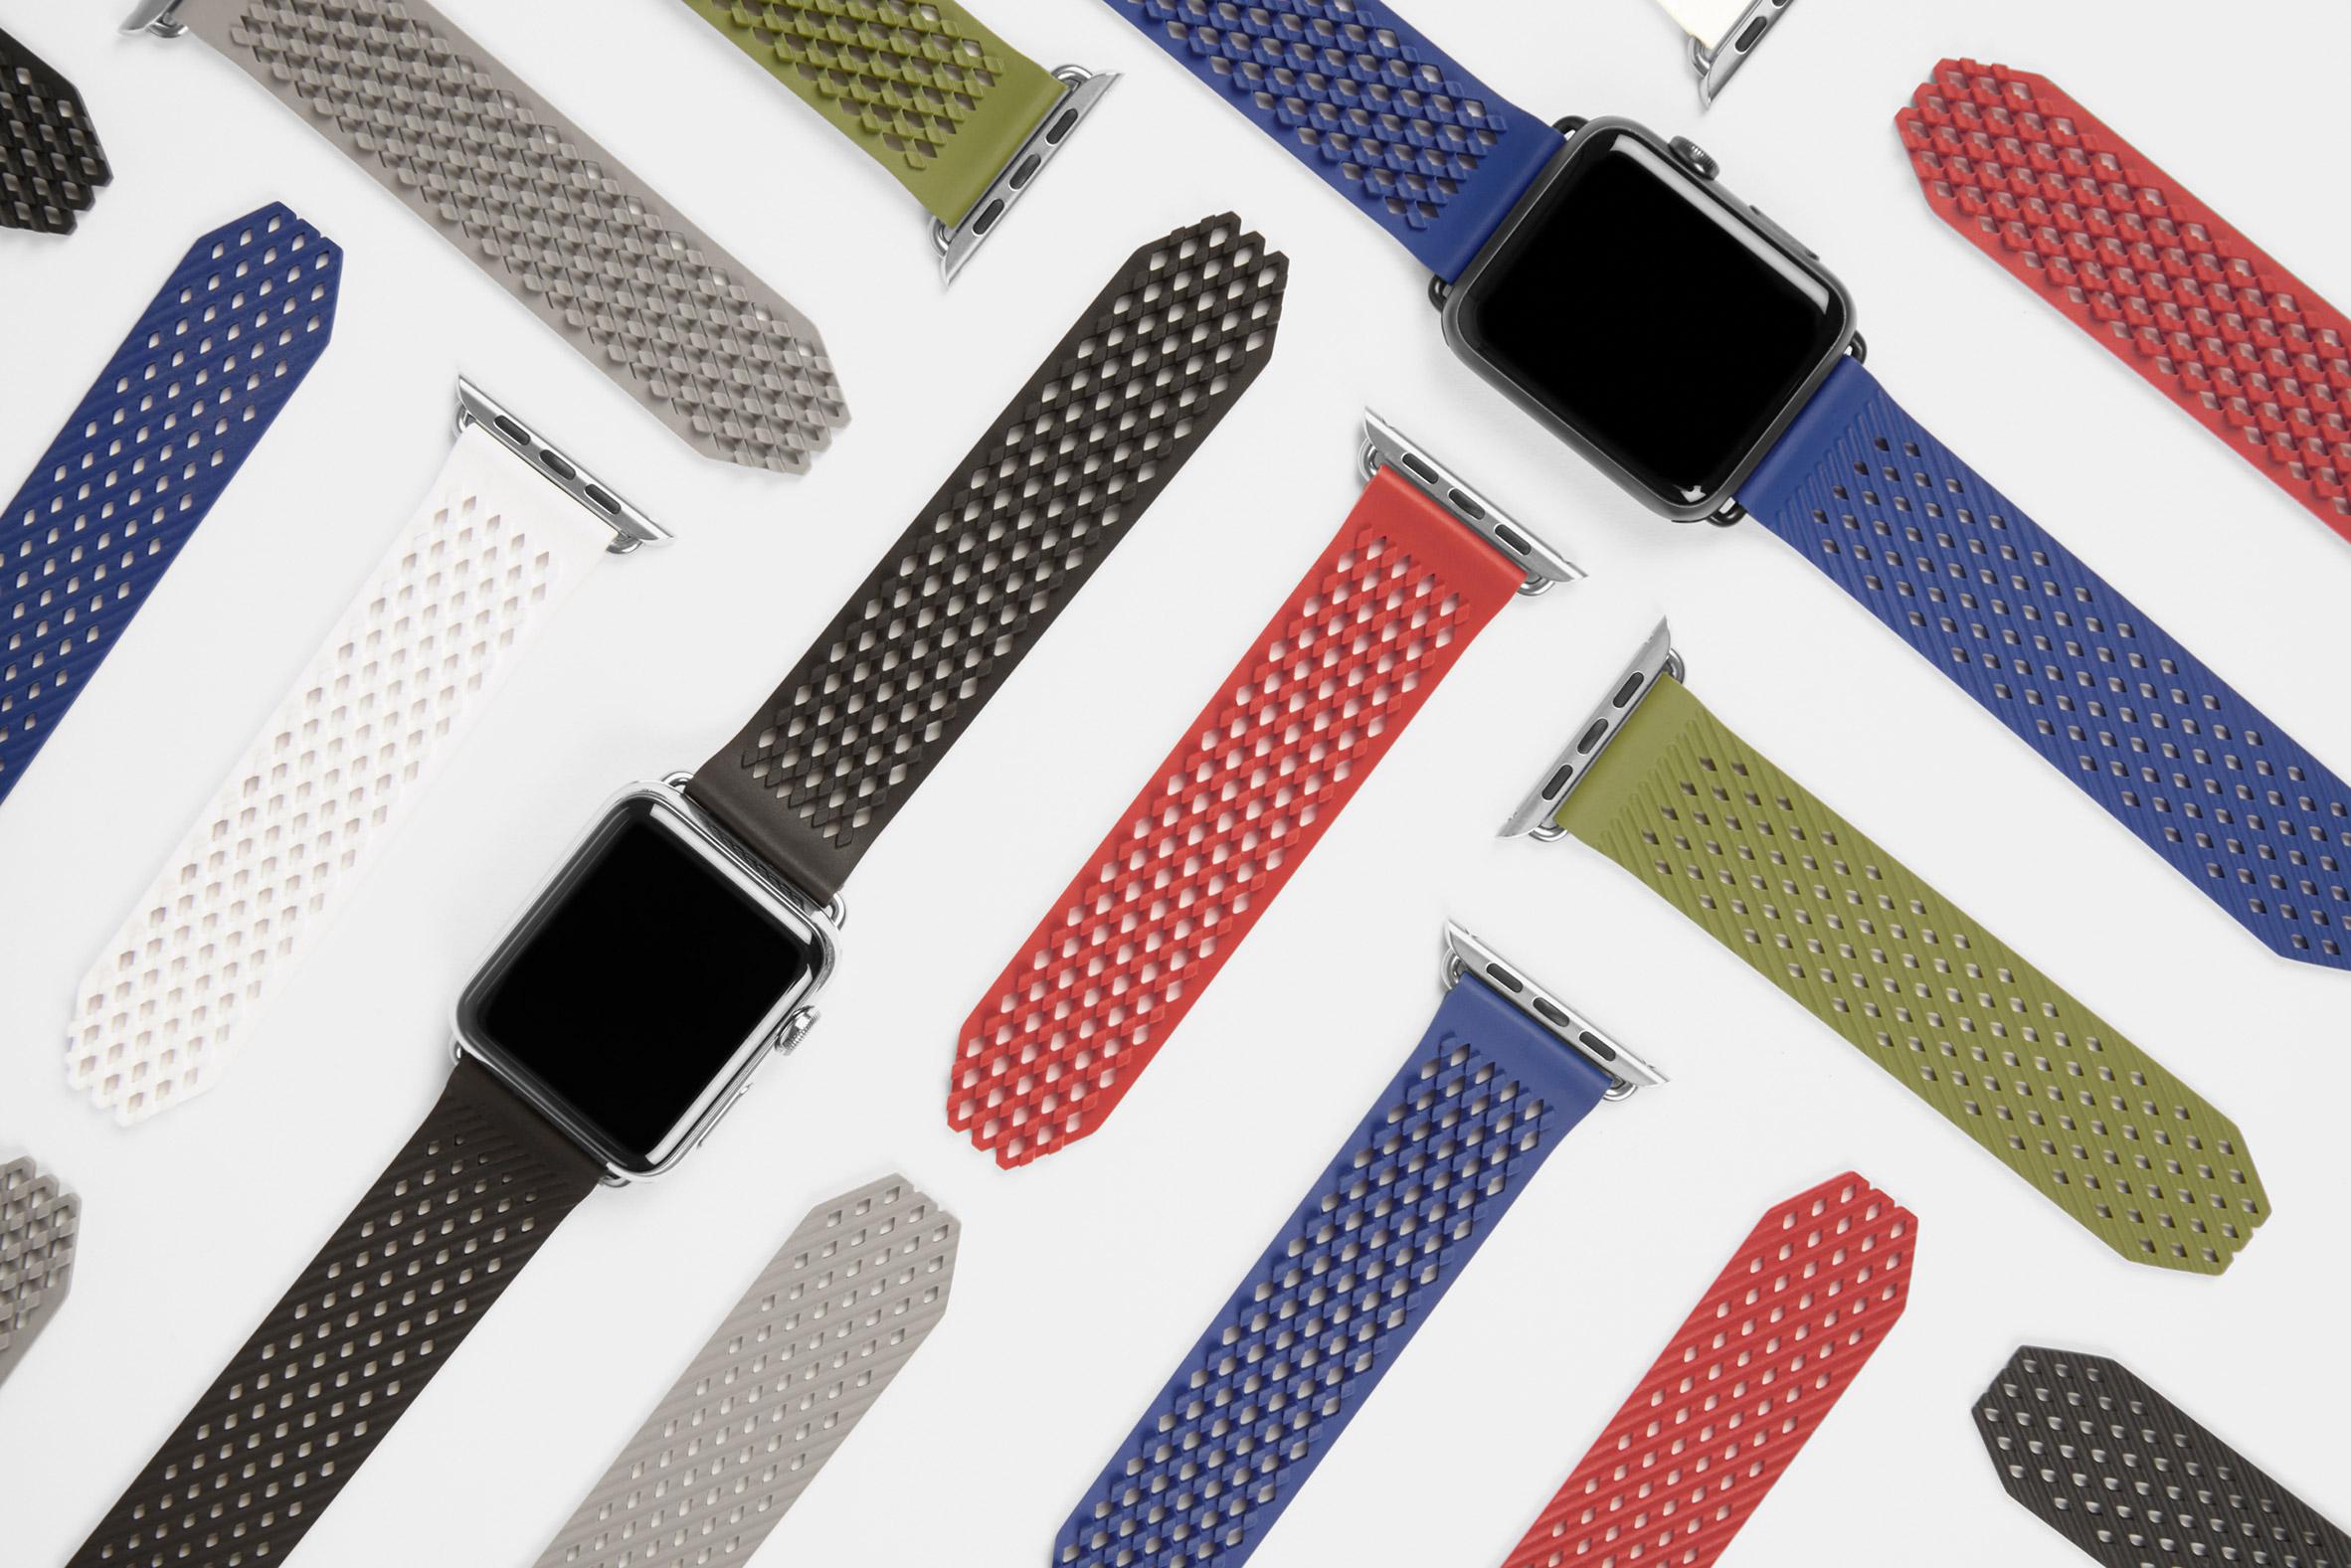 Benjamin Hubert designs self-gripping strap for Apple Watch